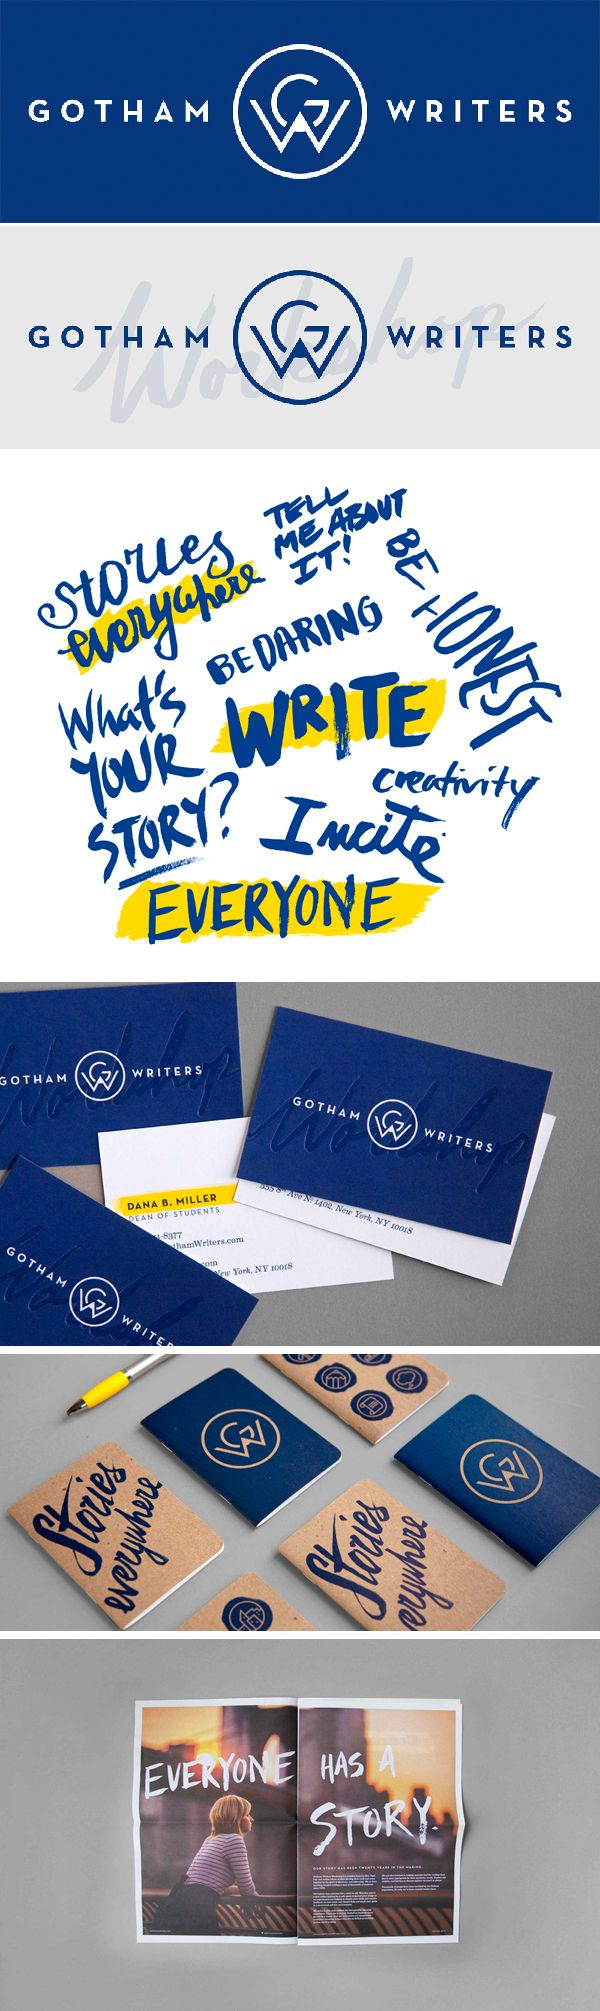 identity / gotham writers